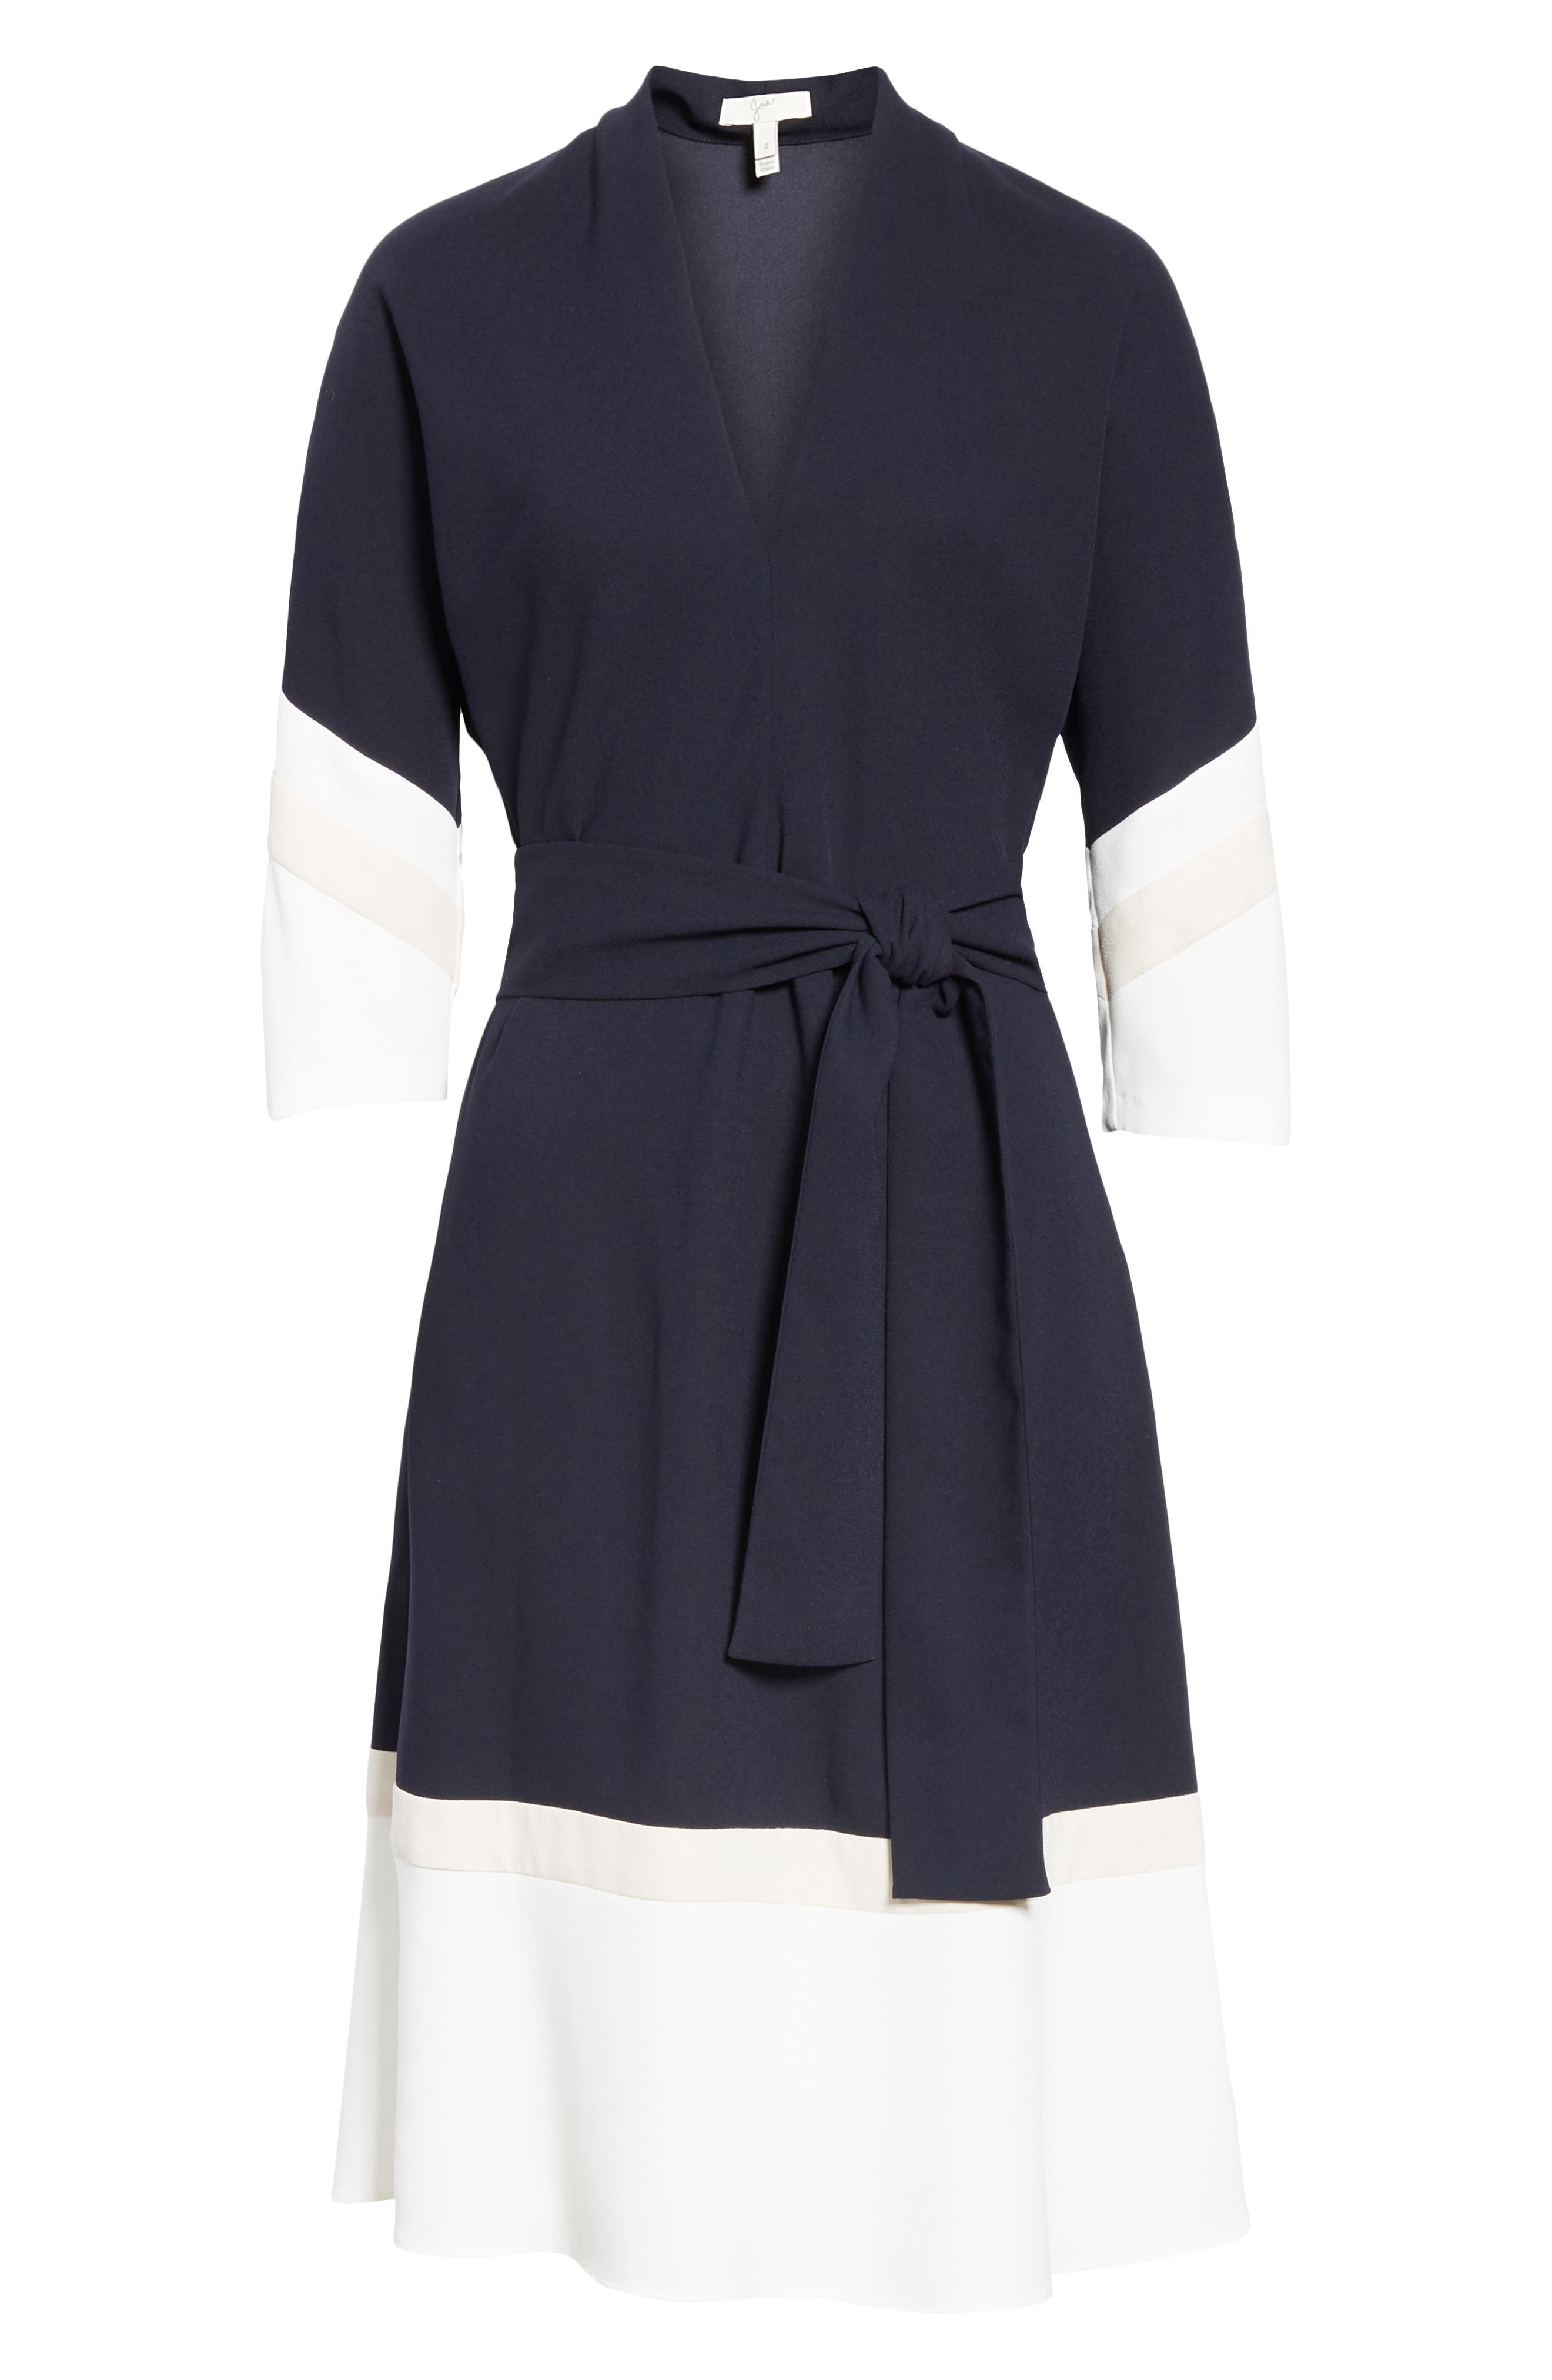 Aydrien Colorblock Dress,                             Alternate thumbnail 7, color,                             MID PORCELAIN-PINK SKY